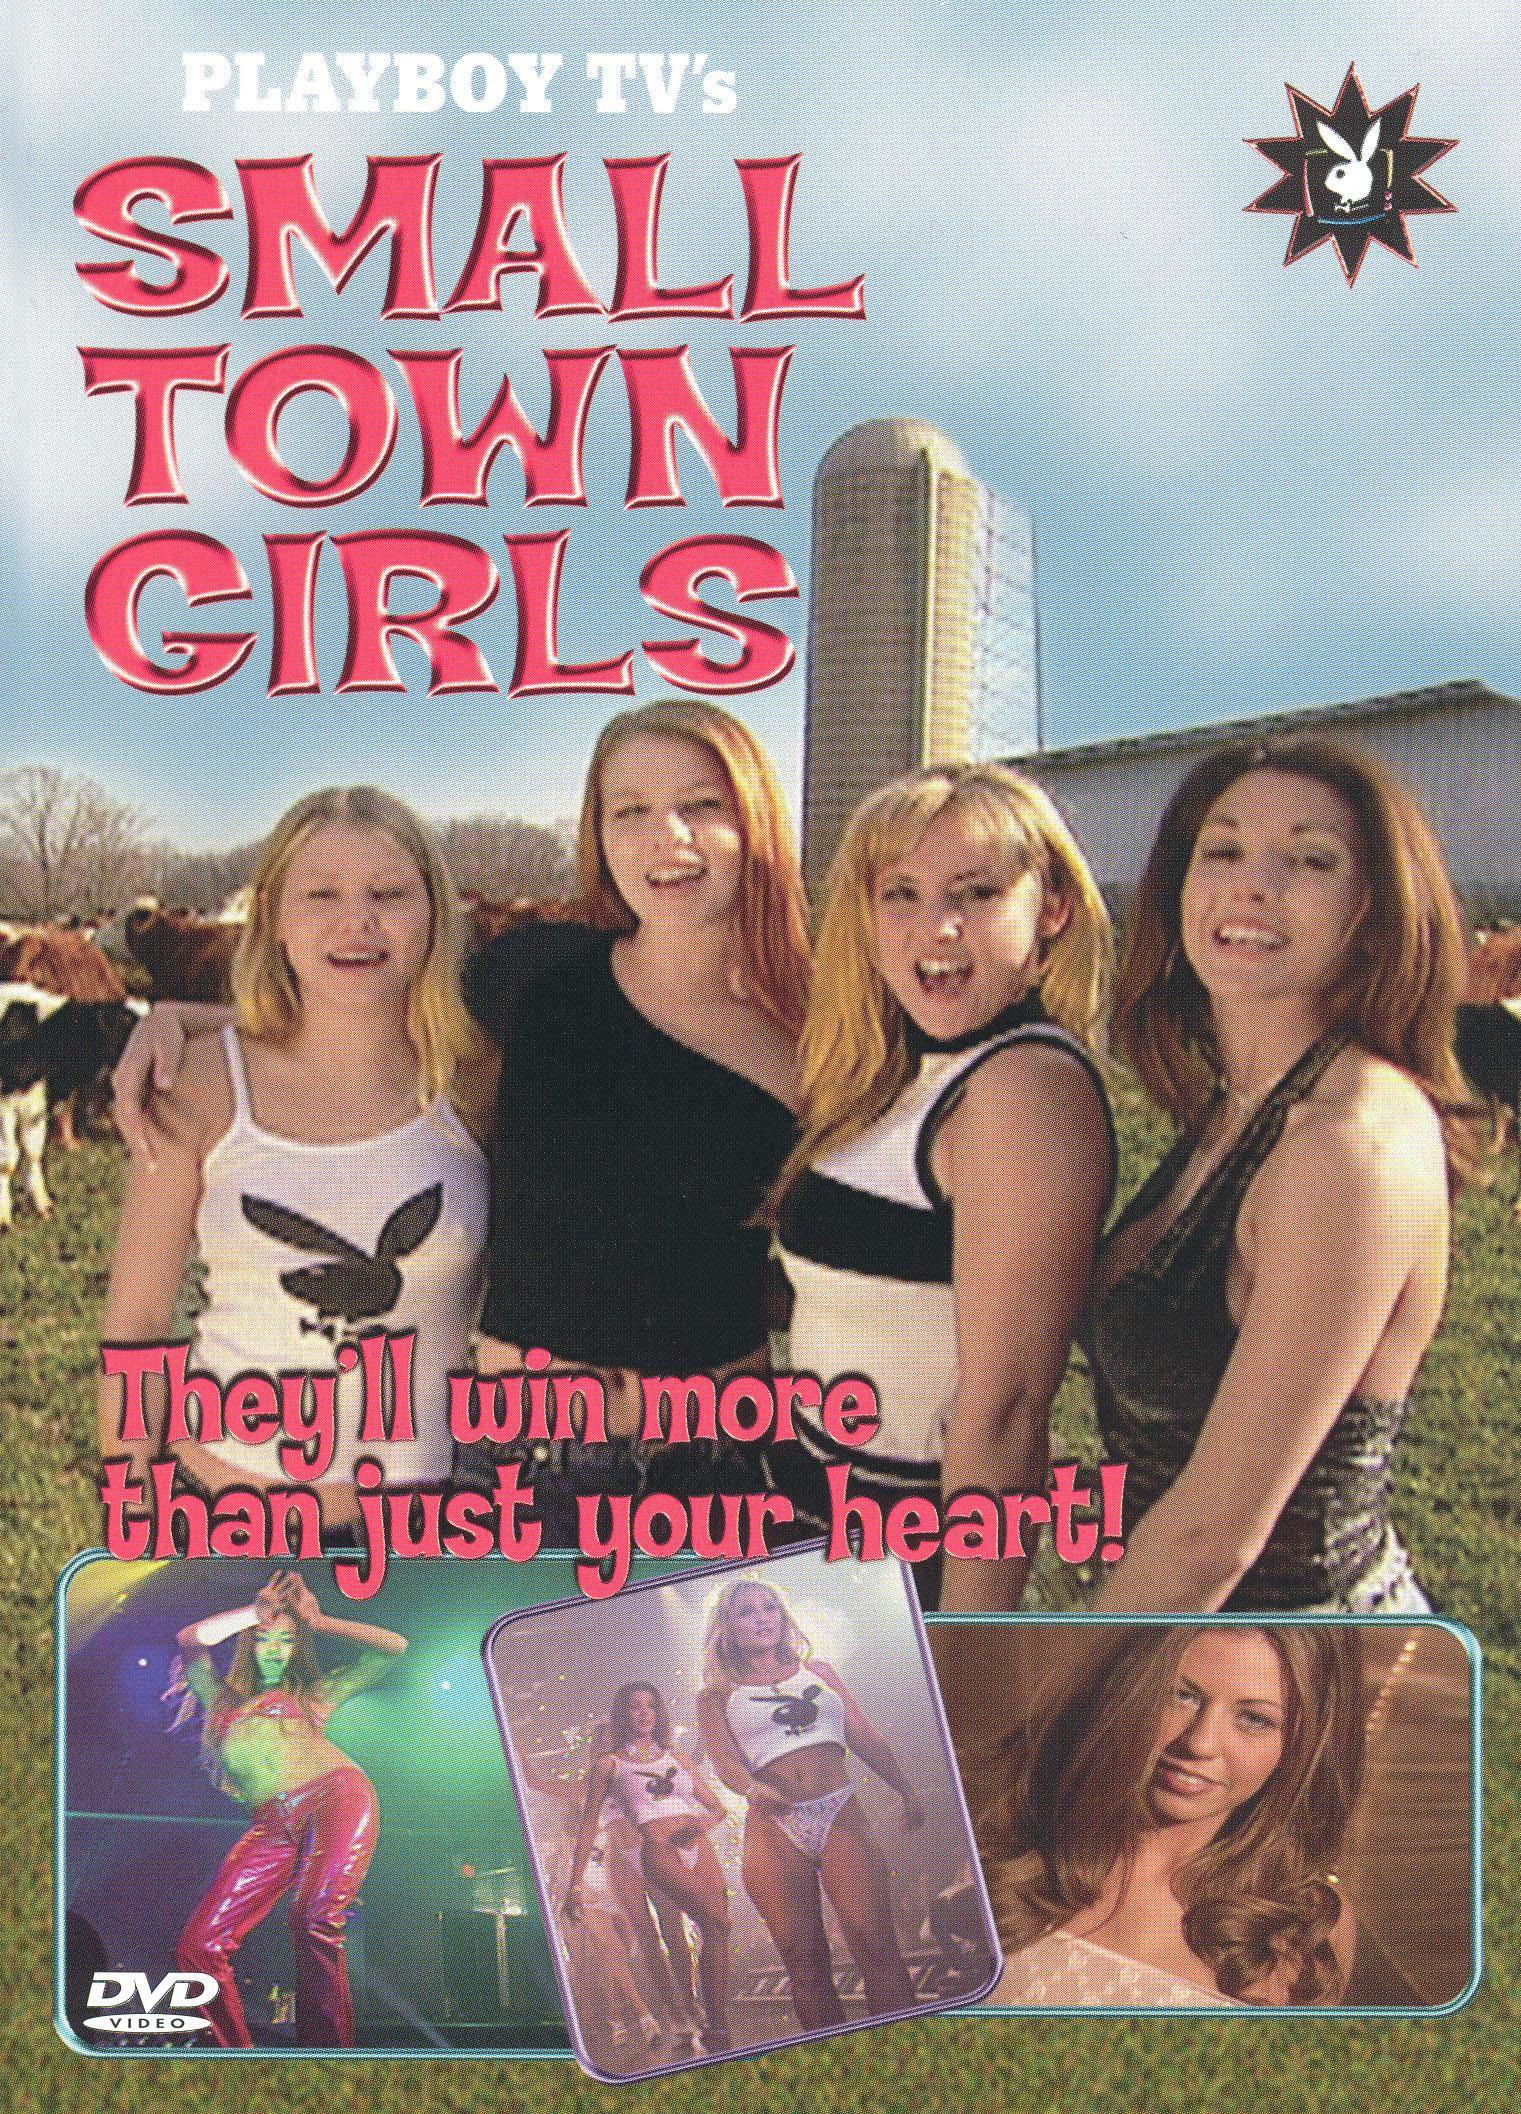 Playboy TV: Small Town Girls